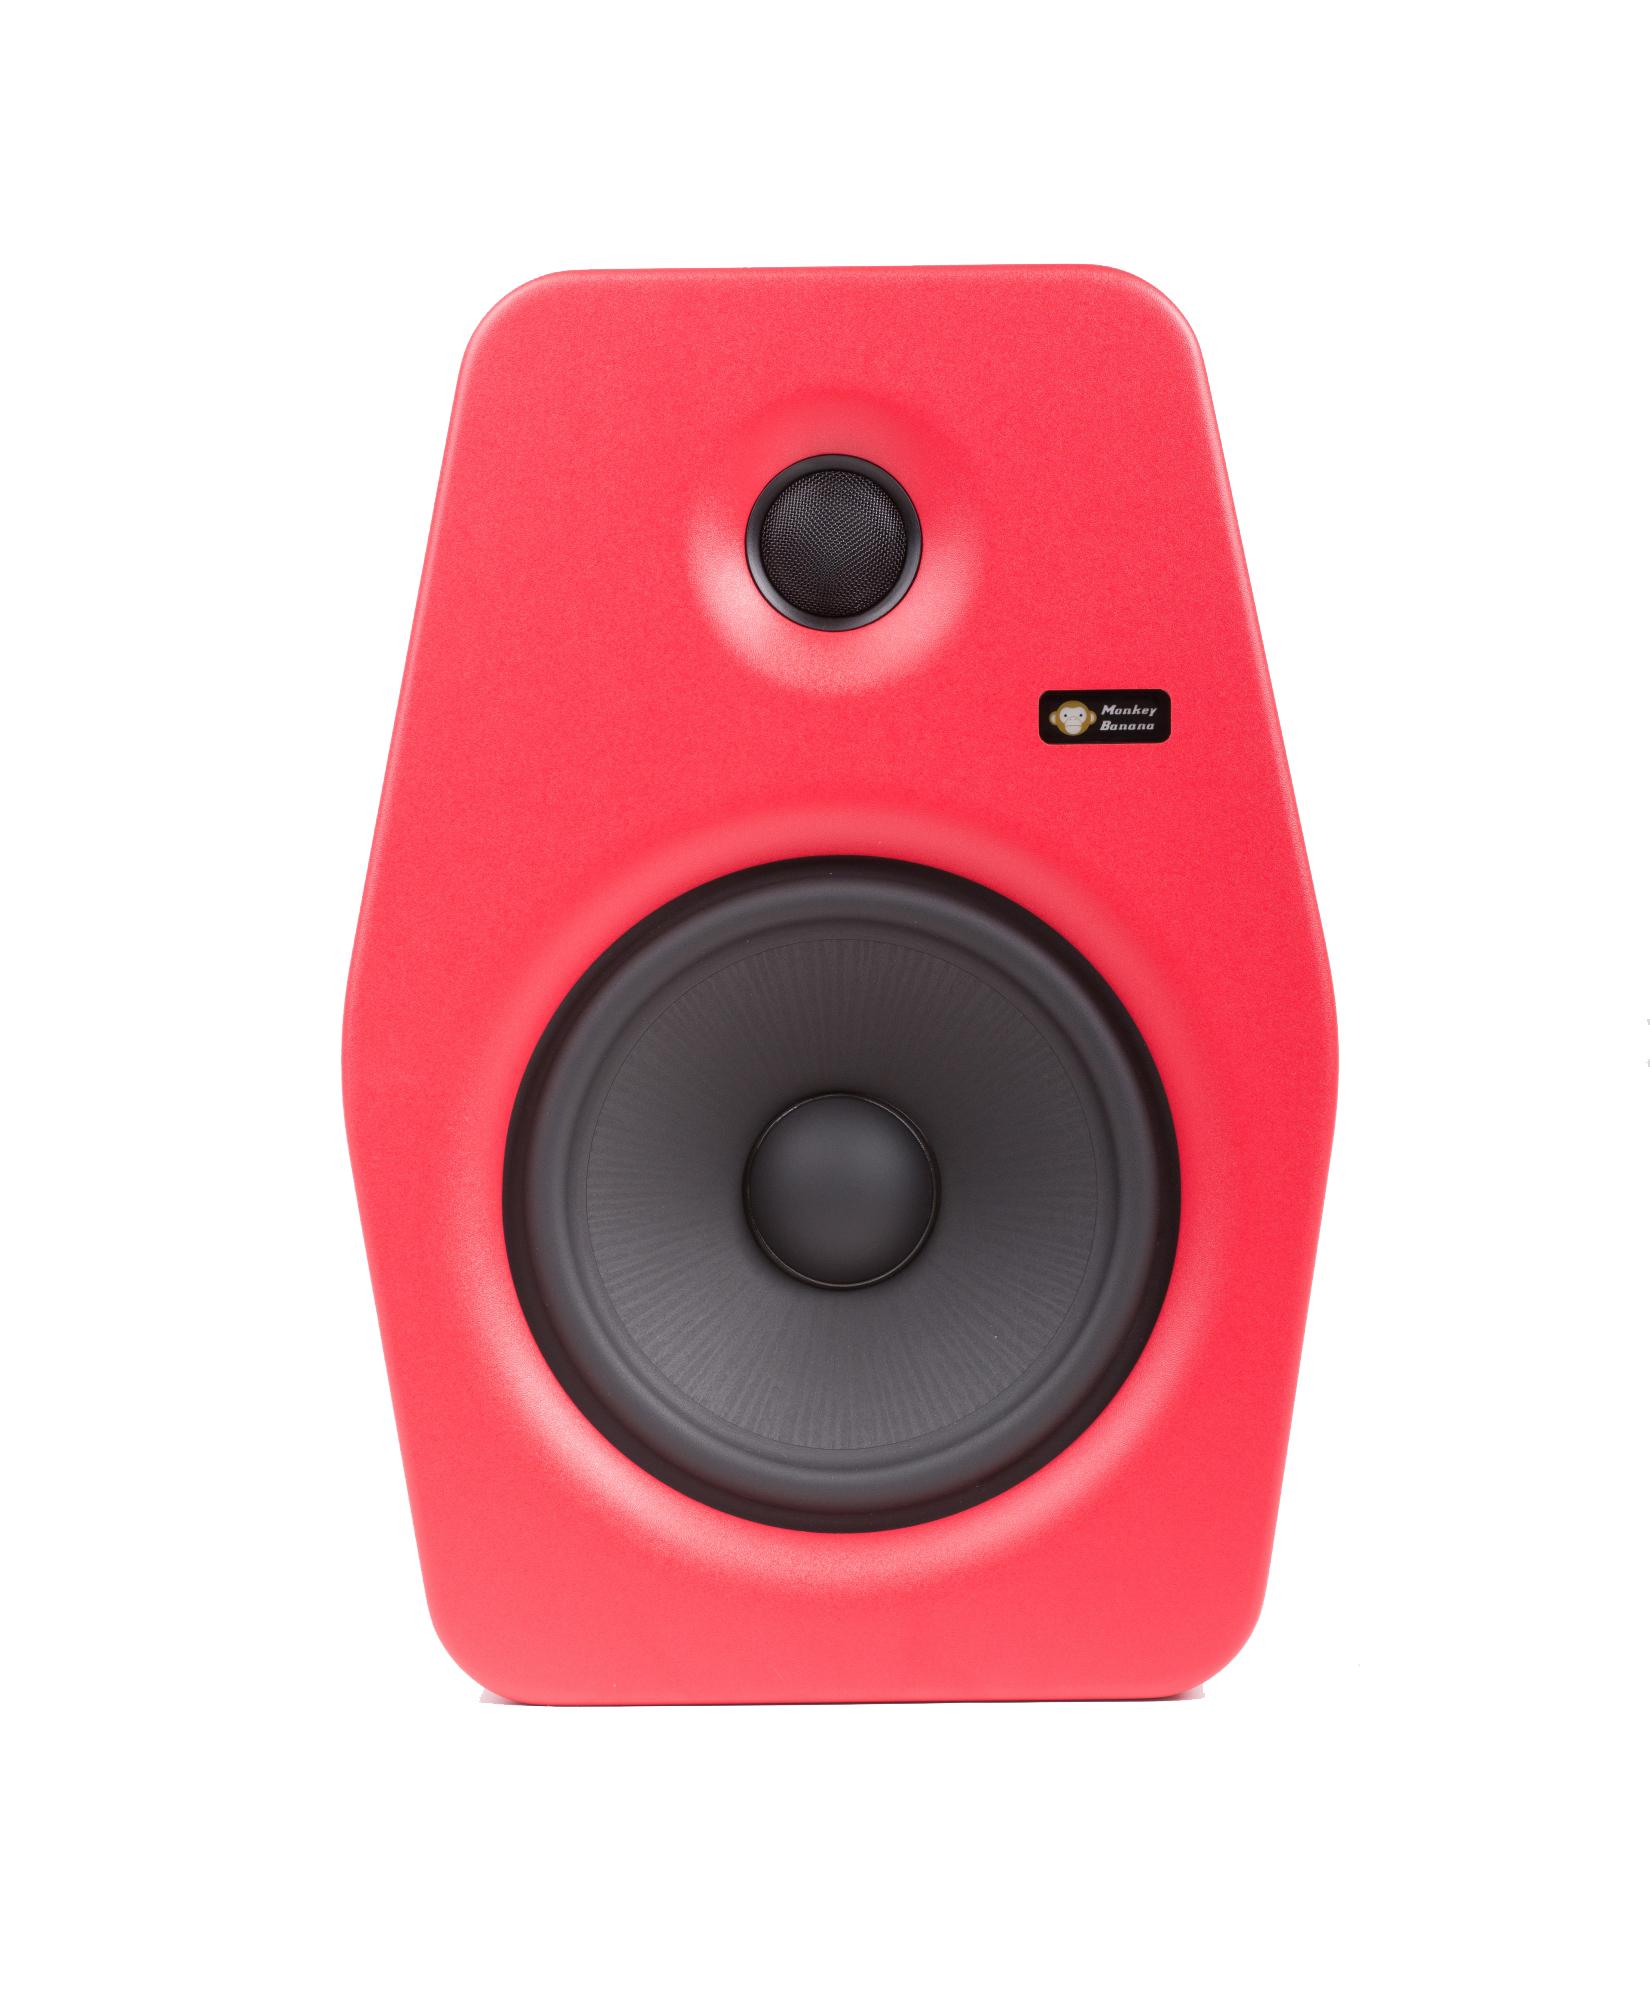 Image of   Monkey Banana Turbo 8 studie højttaler, rød